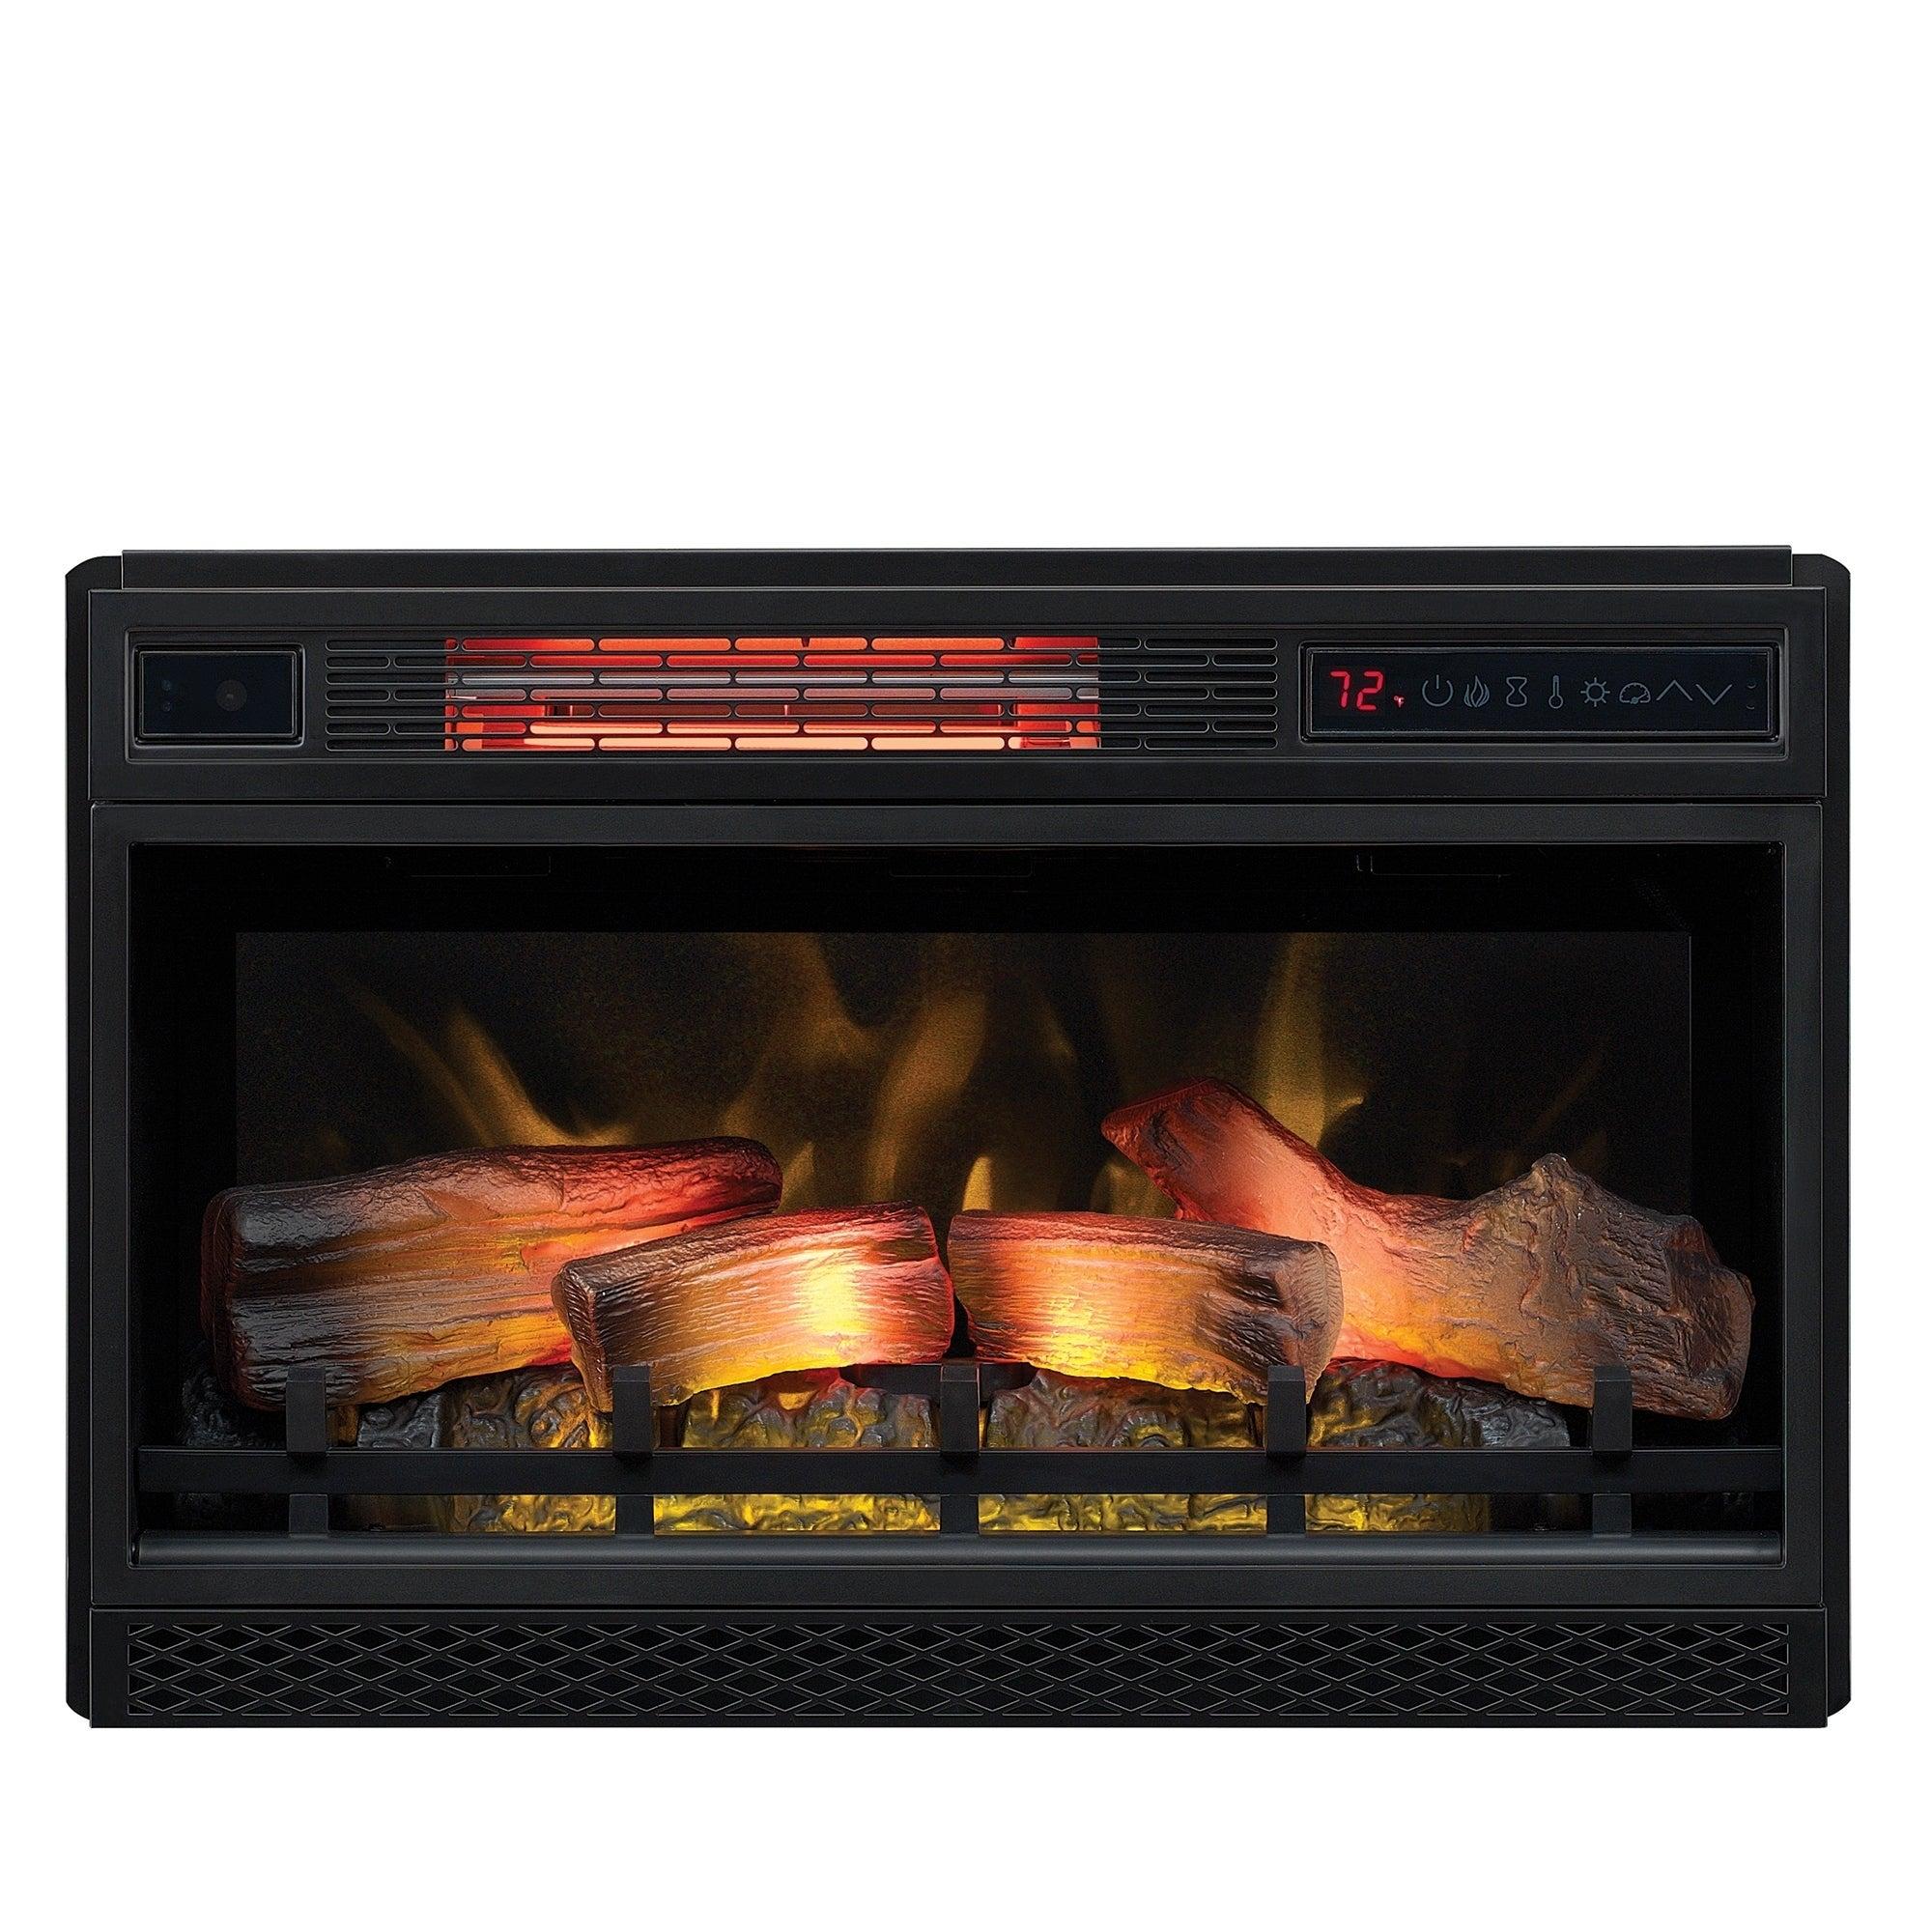 ClassicFlame 26 3D Infrared Quartz Electric Fireplace Insert 9af6e621 c157 40ef 90f2 be4cff39d138